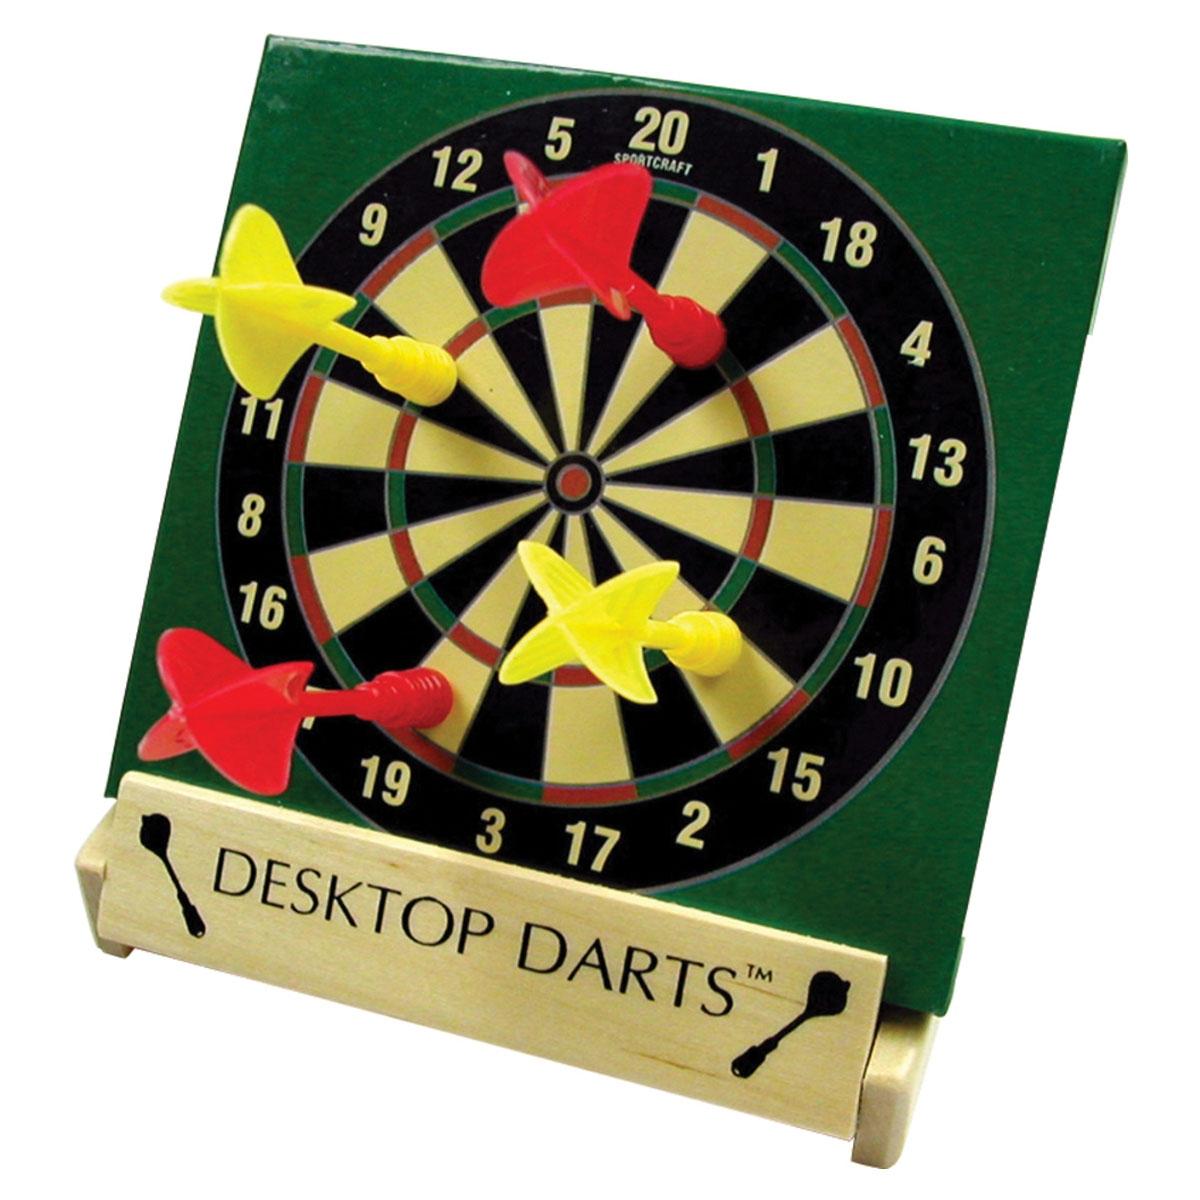 Desktop Darts Mini Dart Board And Dart Set